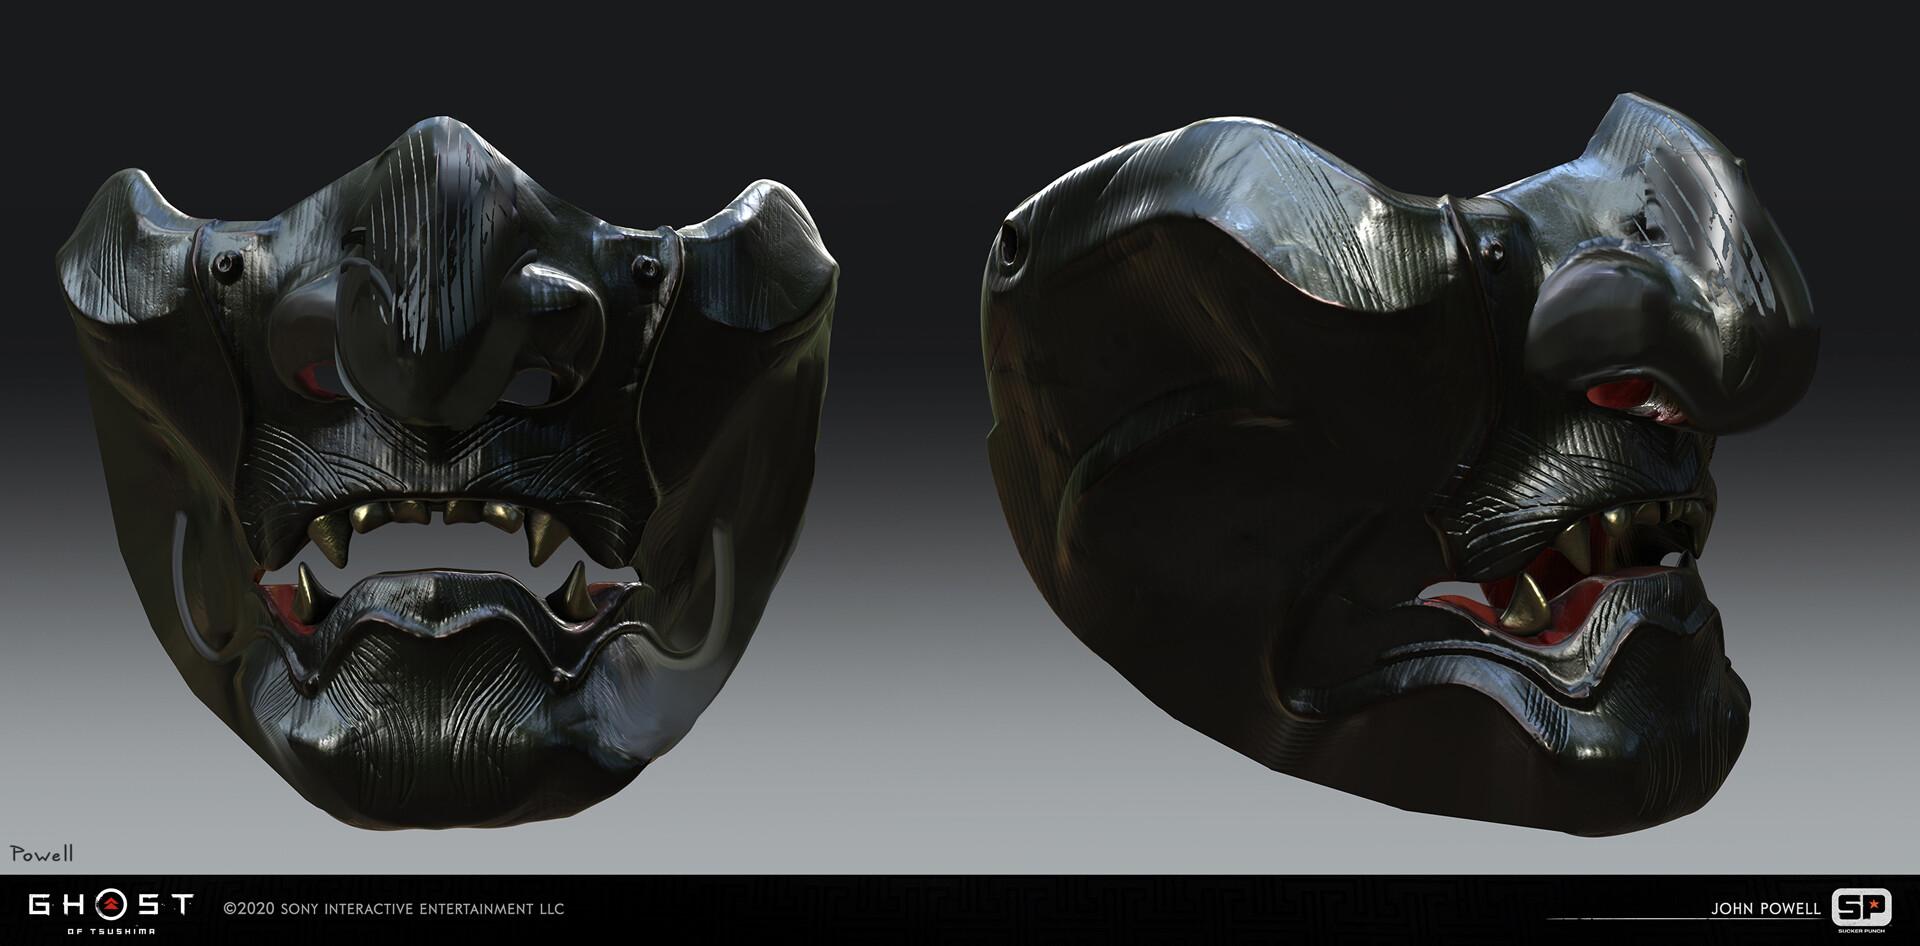 Quelle: ArtStation - John Powell - collectible masks